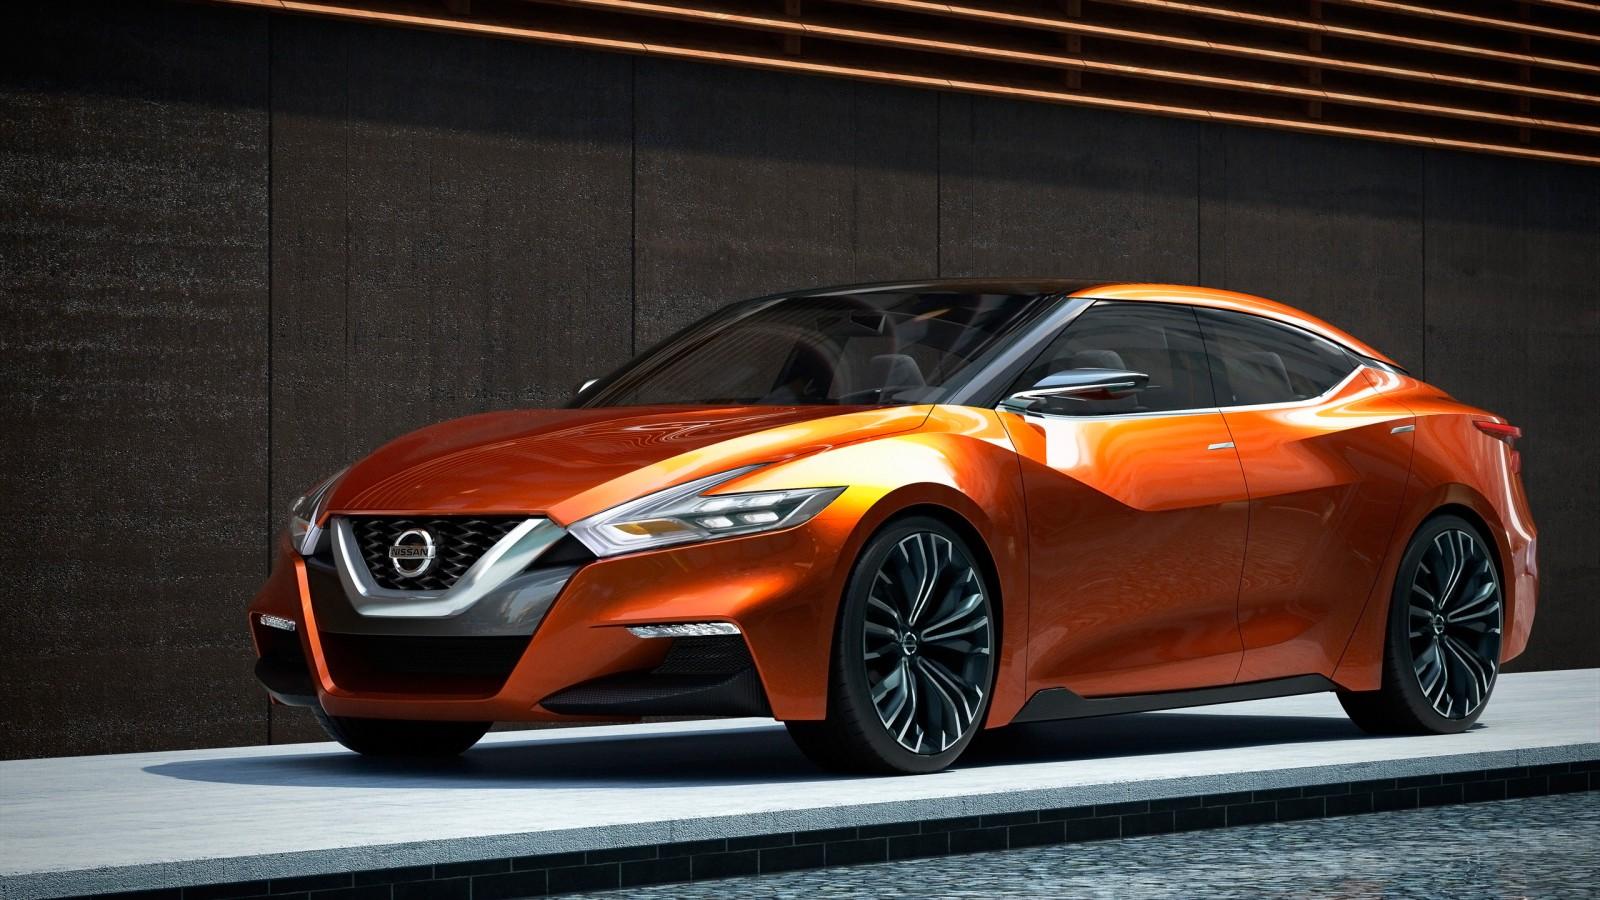 Nissan Sport Sedan Concept 2014 Wallpaper Hd Car